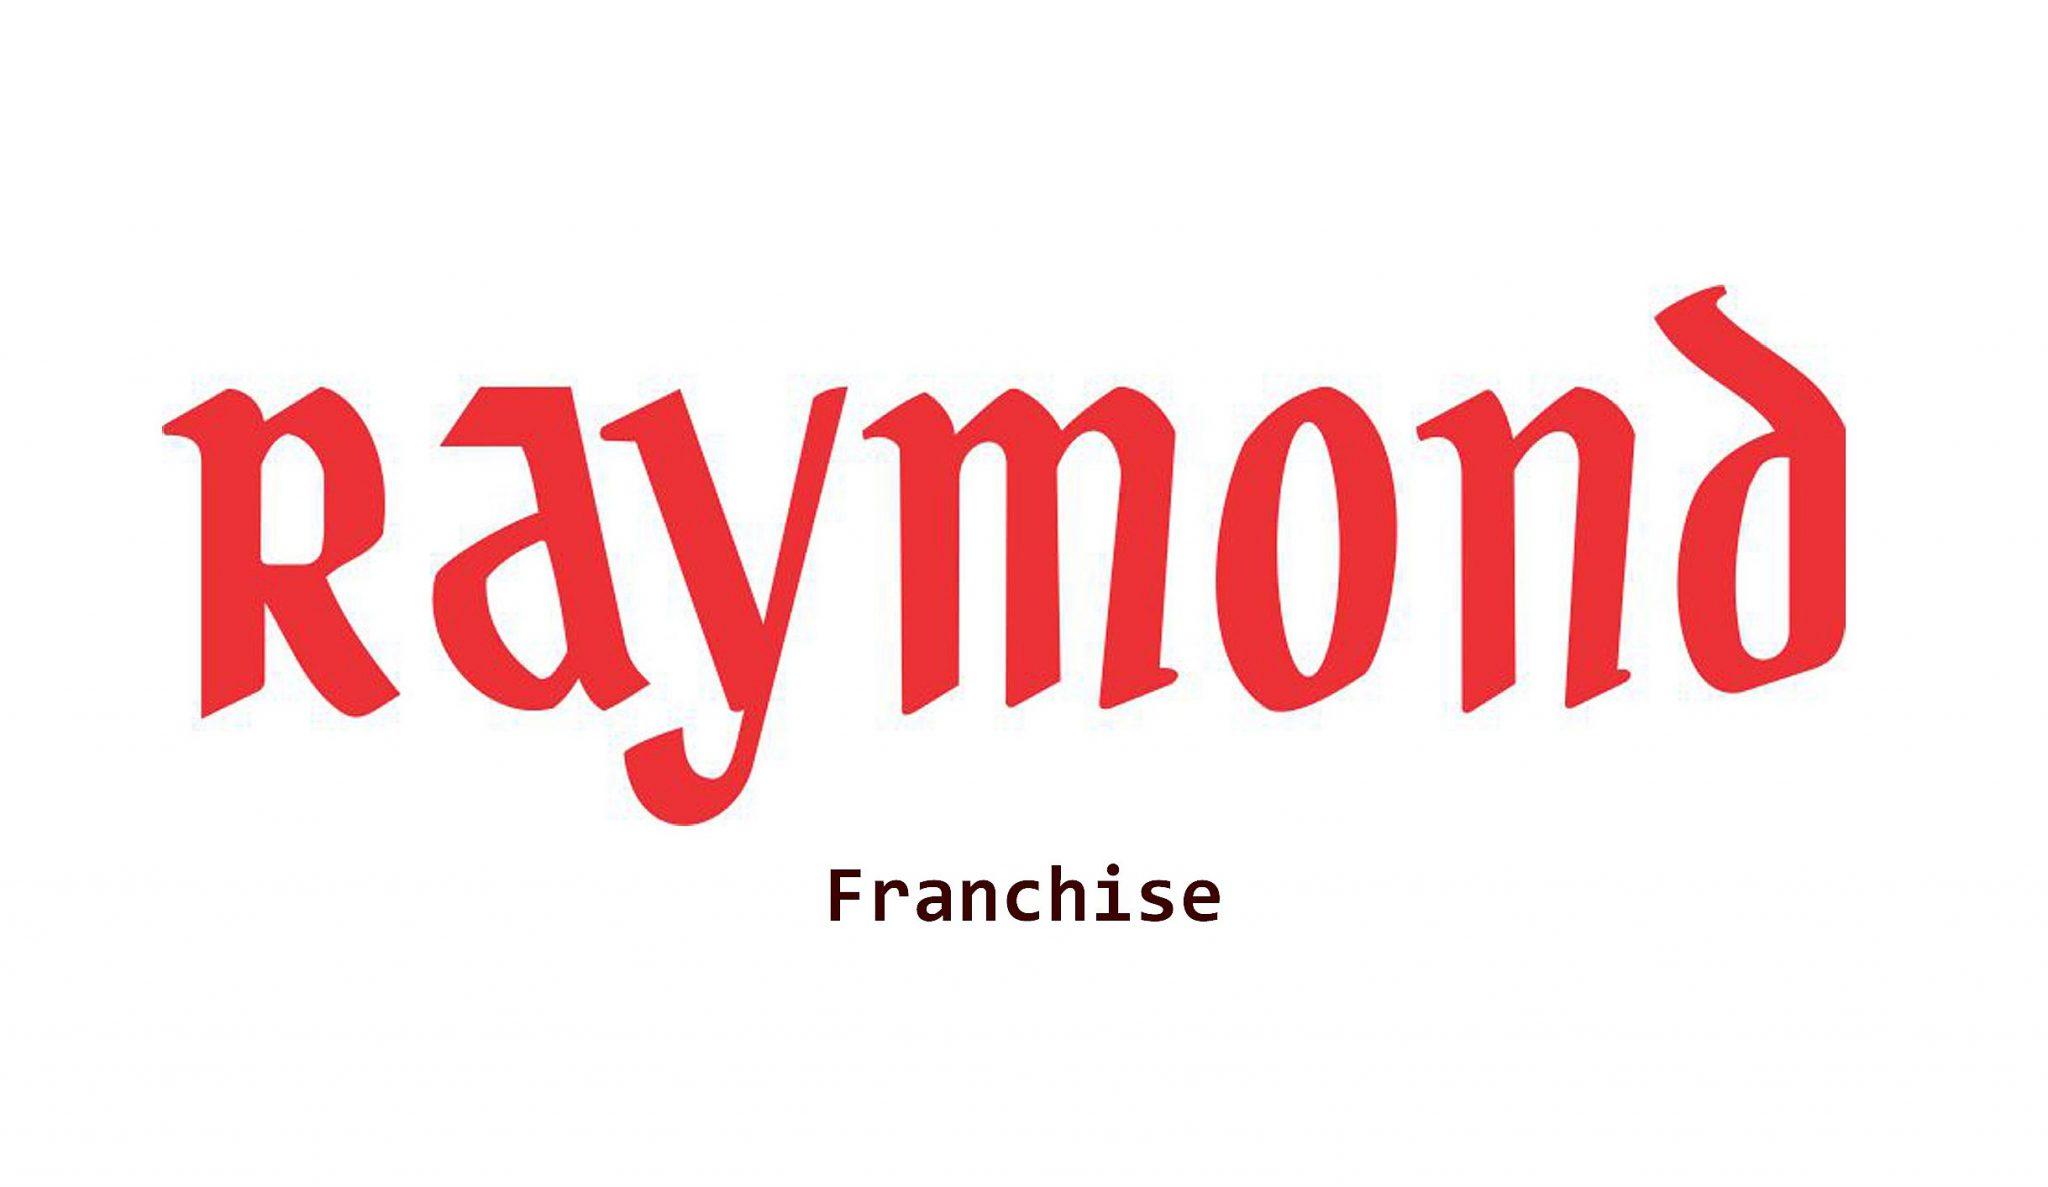 Raymond franchise